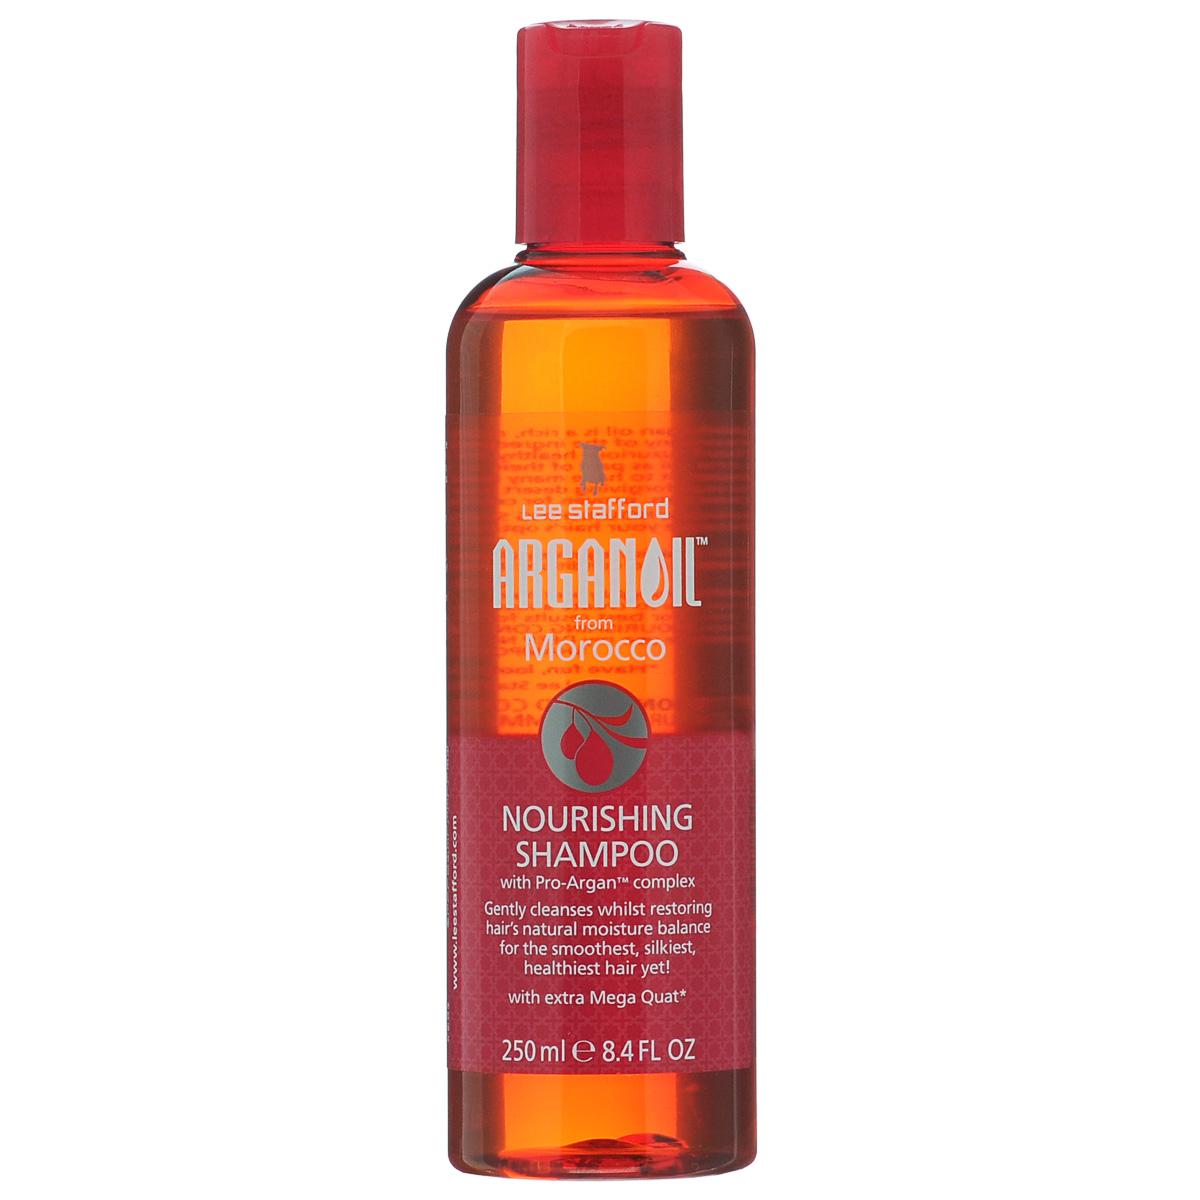 Lee Stafford Питательный шампунь для волос с аргановым маслом Arganoil From Marocco, 250 мл lee stafford шампунь для вьющихся волос here come the curls 250 мл